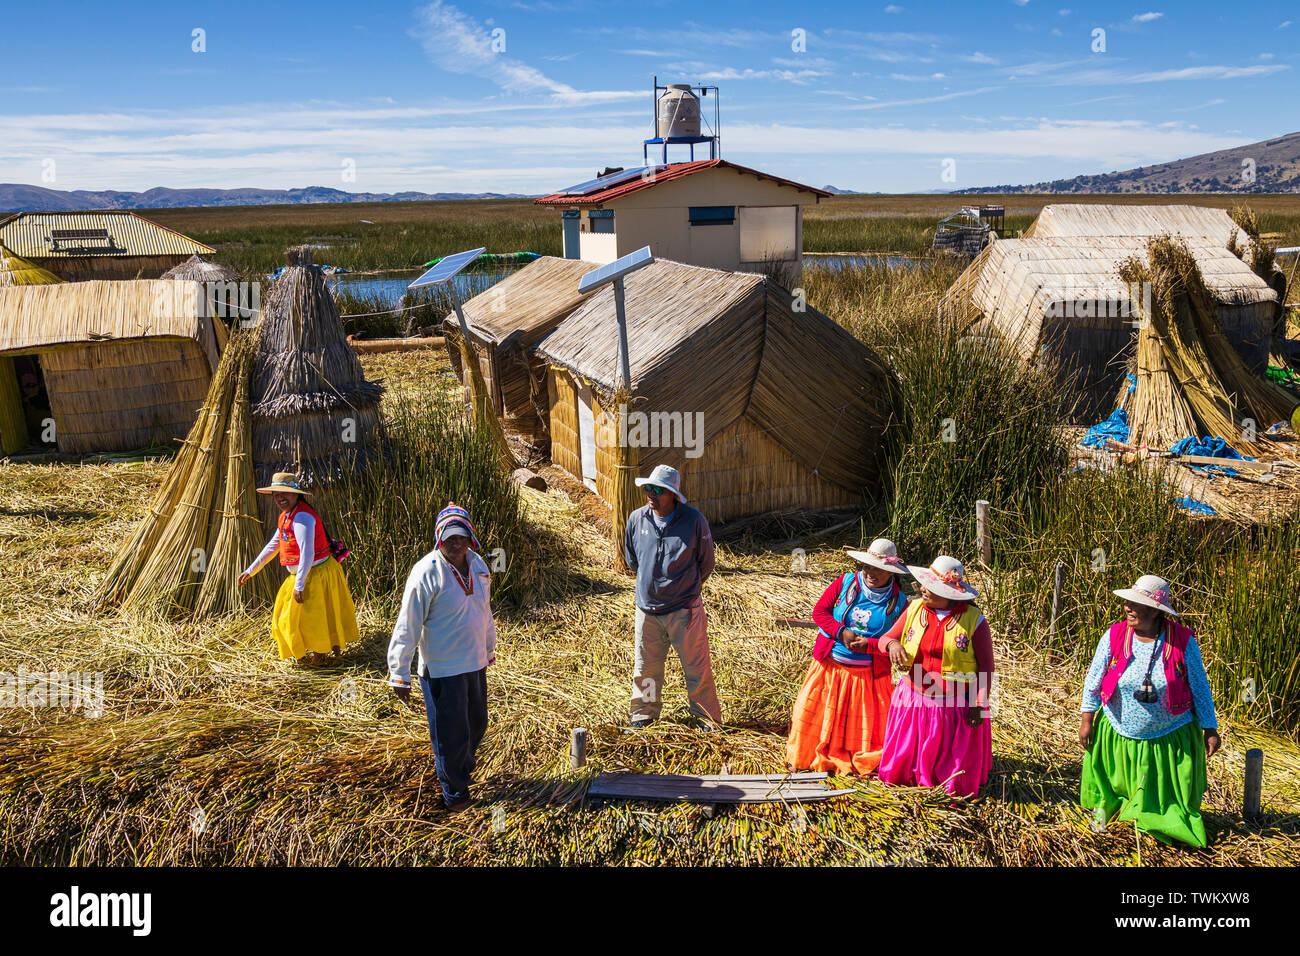 Islanders on Uros islands, reed floating islands on Lake Titicaca, Peru, South America - Stock Image